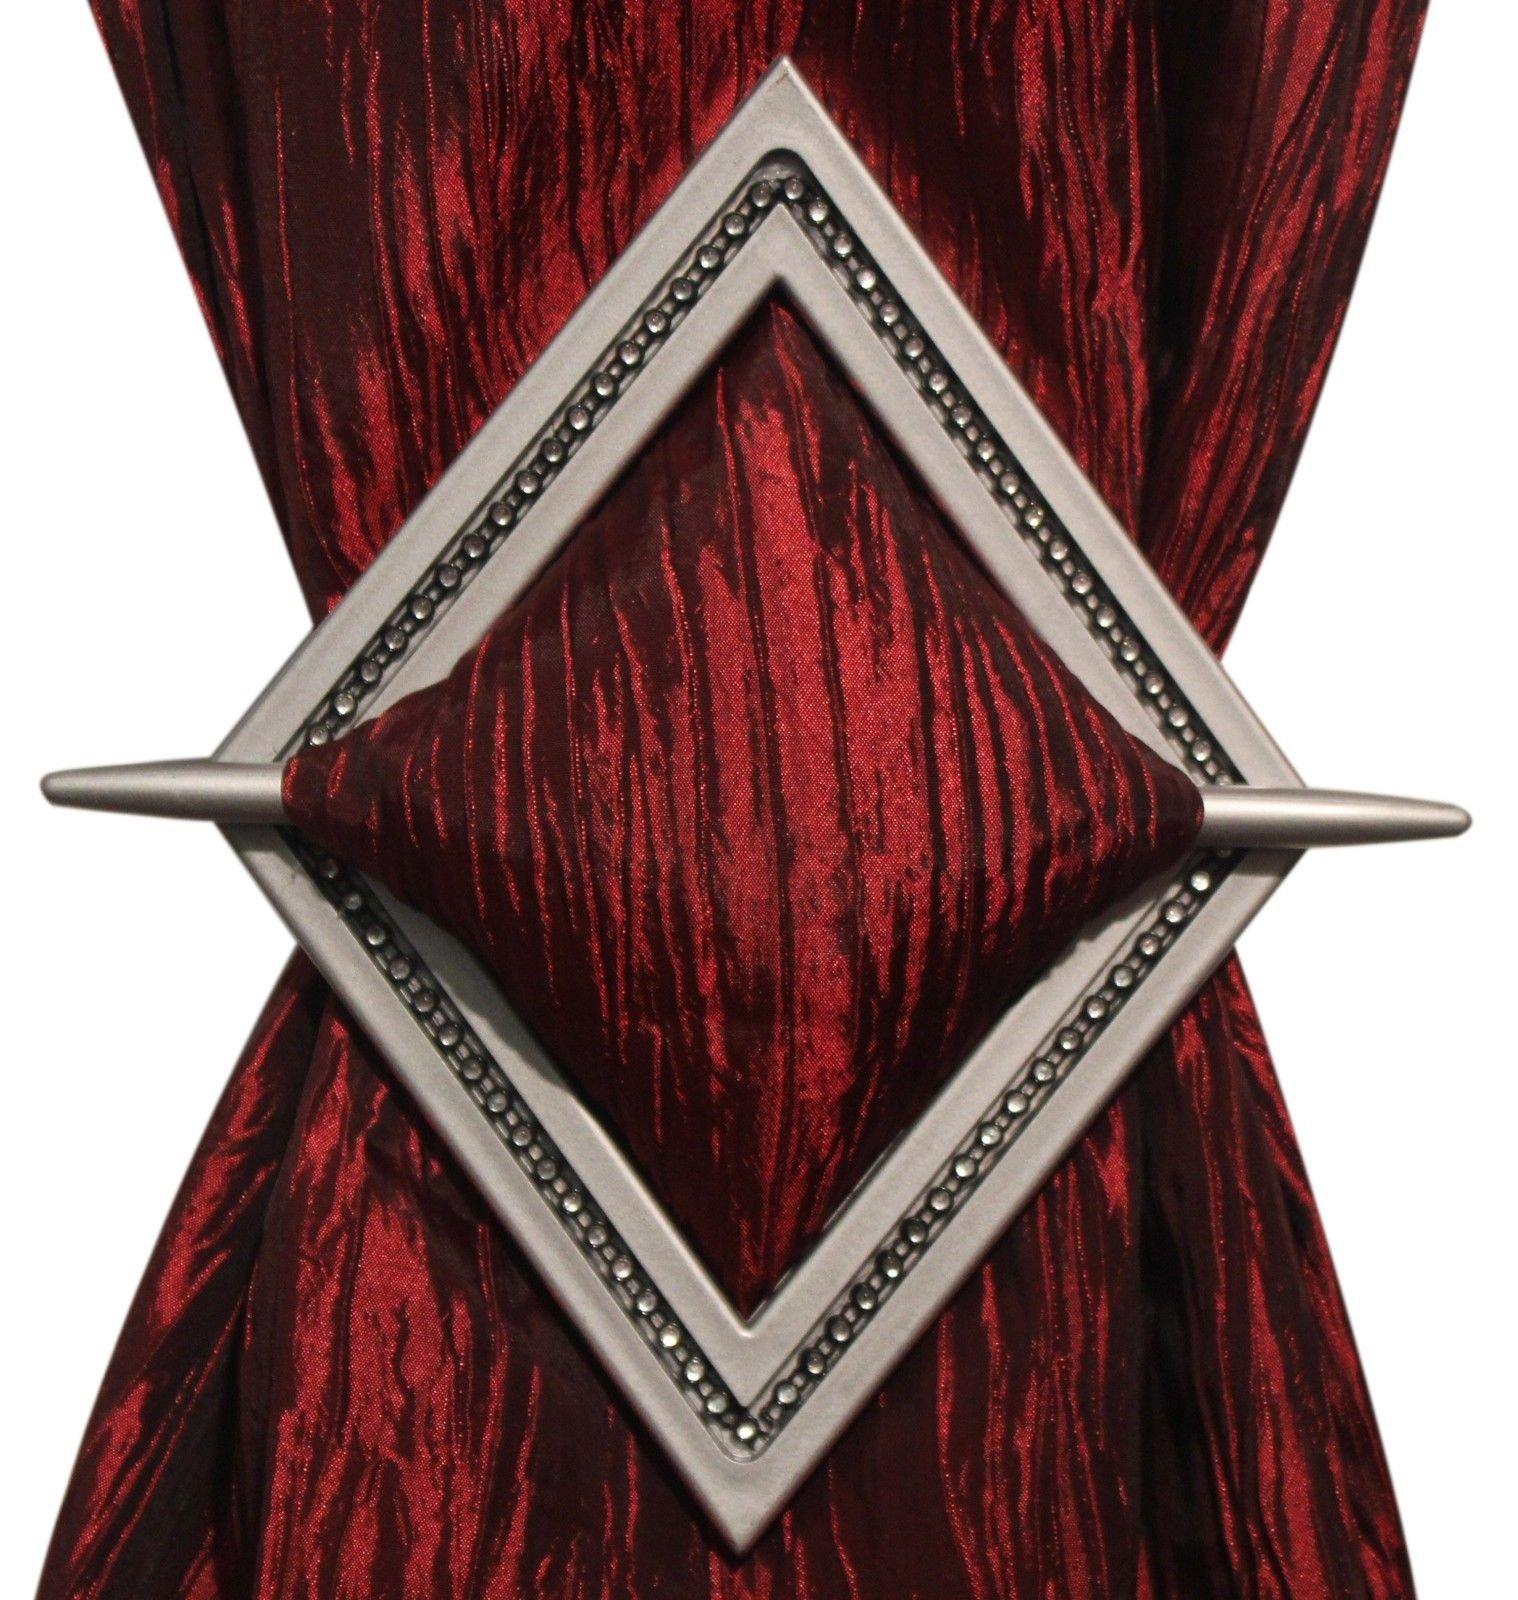 Set of 2 Decorative Curtain Holdbacks Window Curtain Tieback, Bling Diamond, 8''x6'', Bronze, Silver, Gold, and Black (Silver)